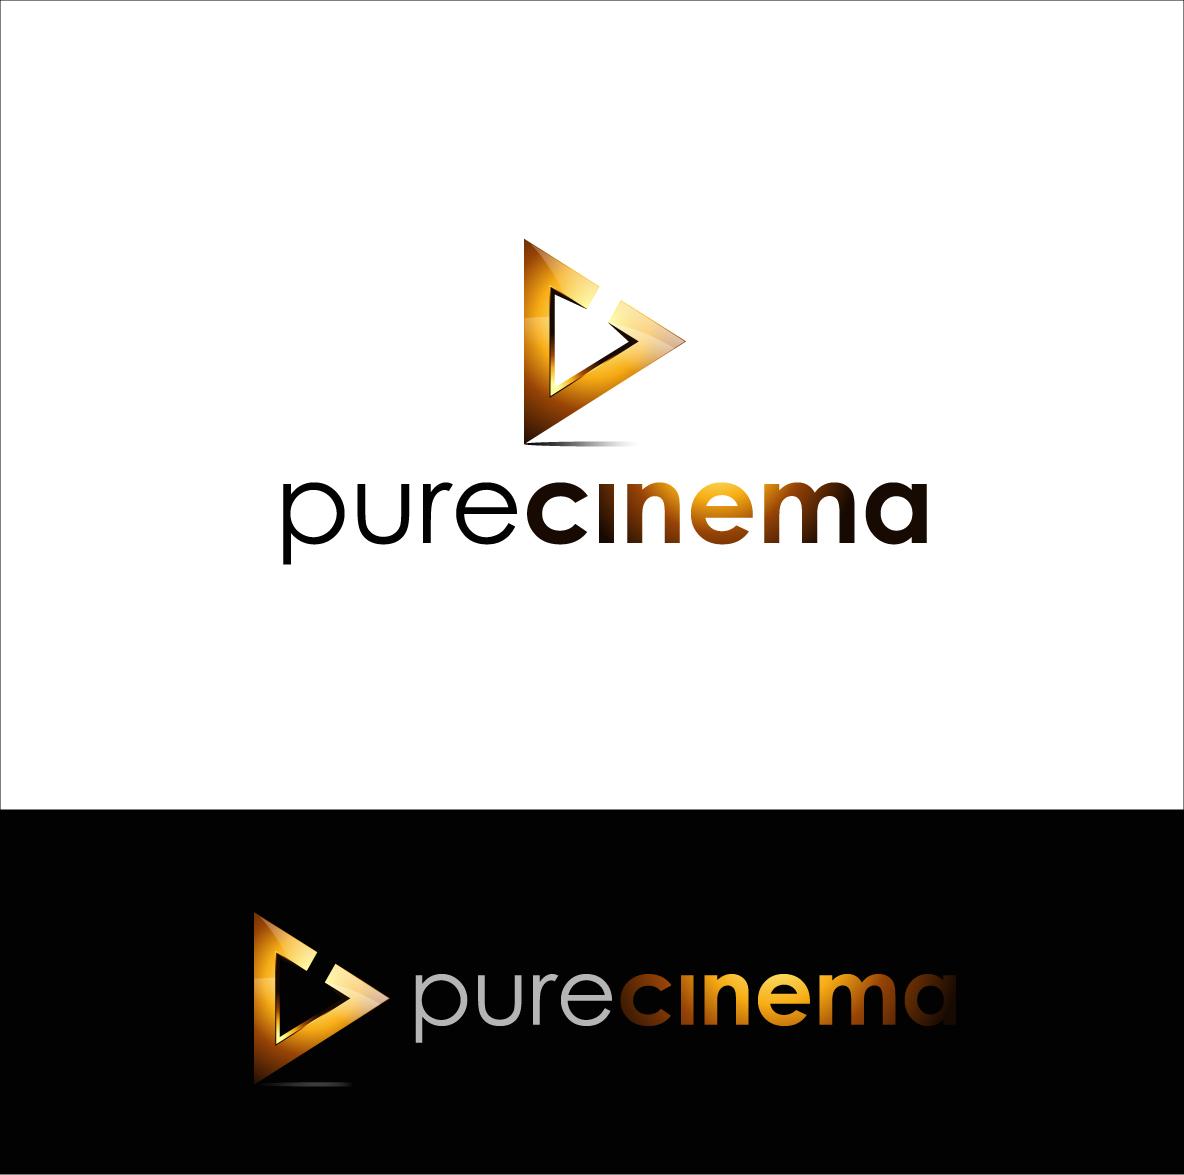 Logo Design by zoiDesign - Entry No. 110 in the Logo Design Contest Imaginative Logo Design for Pure Cinema.